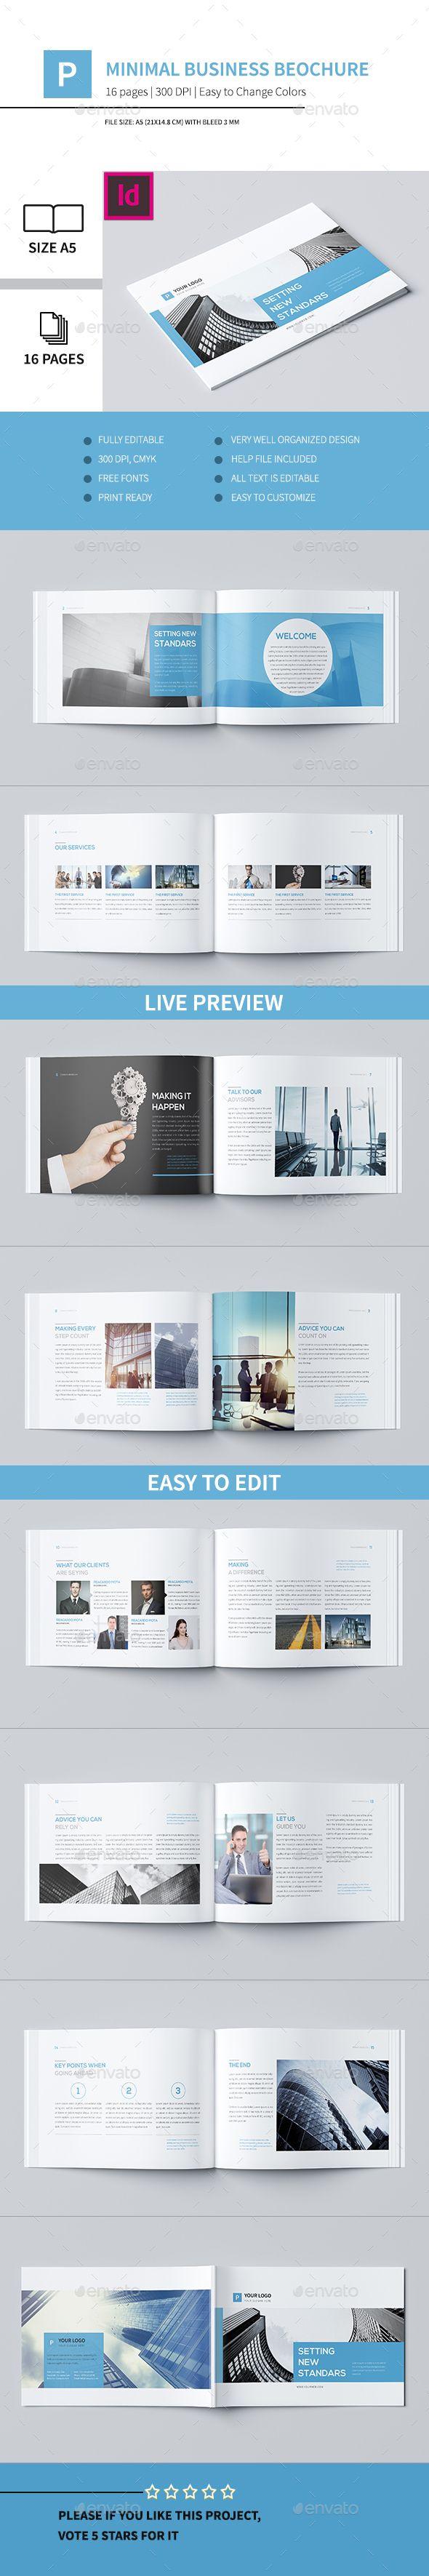 Minimal Business Brochure Template InDesign INDD #design Download: http://graphicriver.net/item/minimal-business-brochure-v/13390496?ref=ksioks